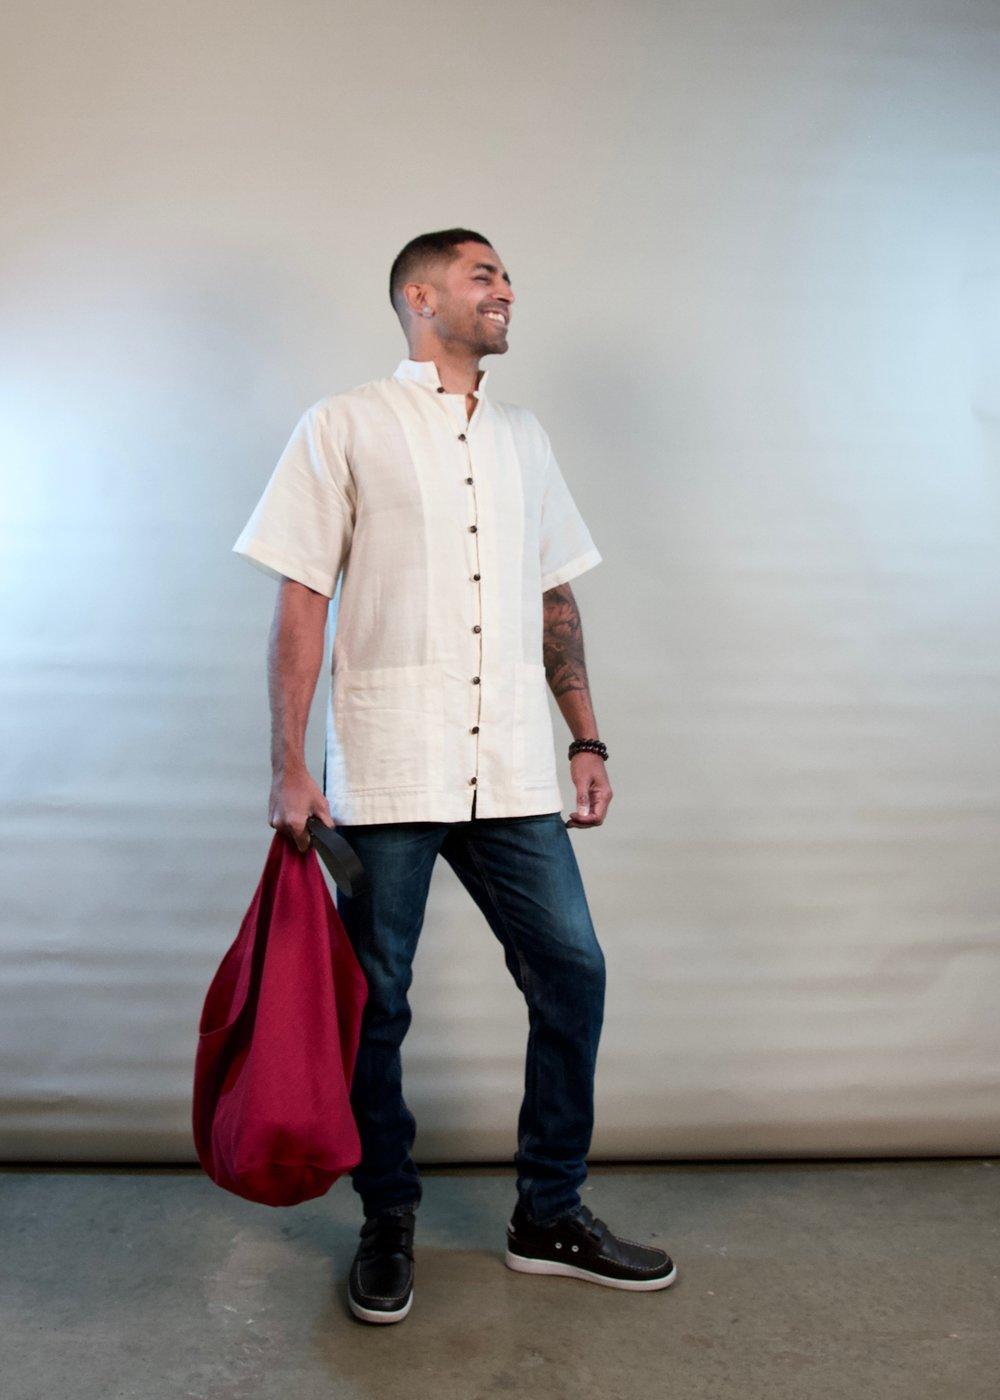 - LARGE LINEN BAG IN SCARLET W/ ORIGINAL HANDLE IN BLACK